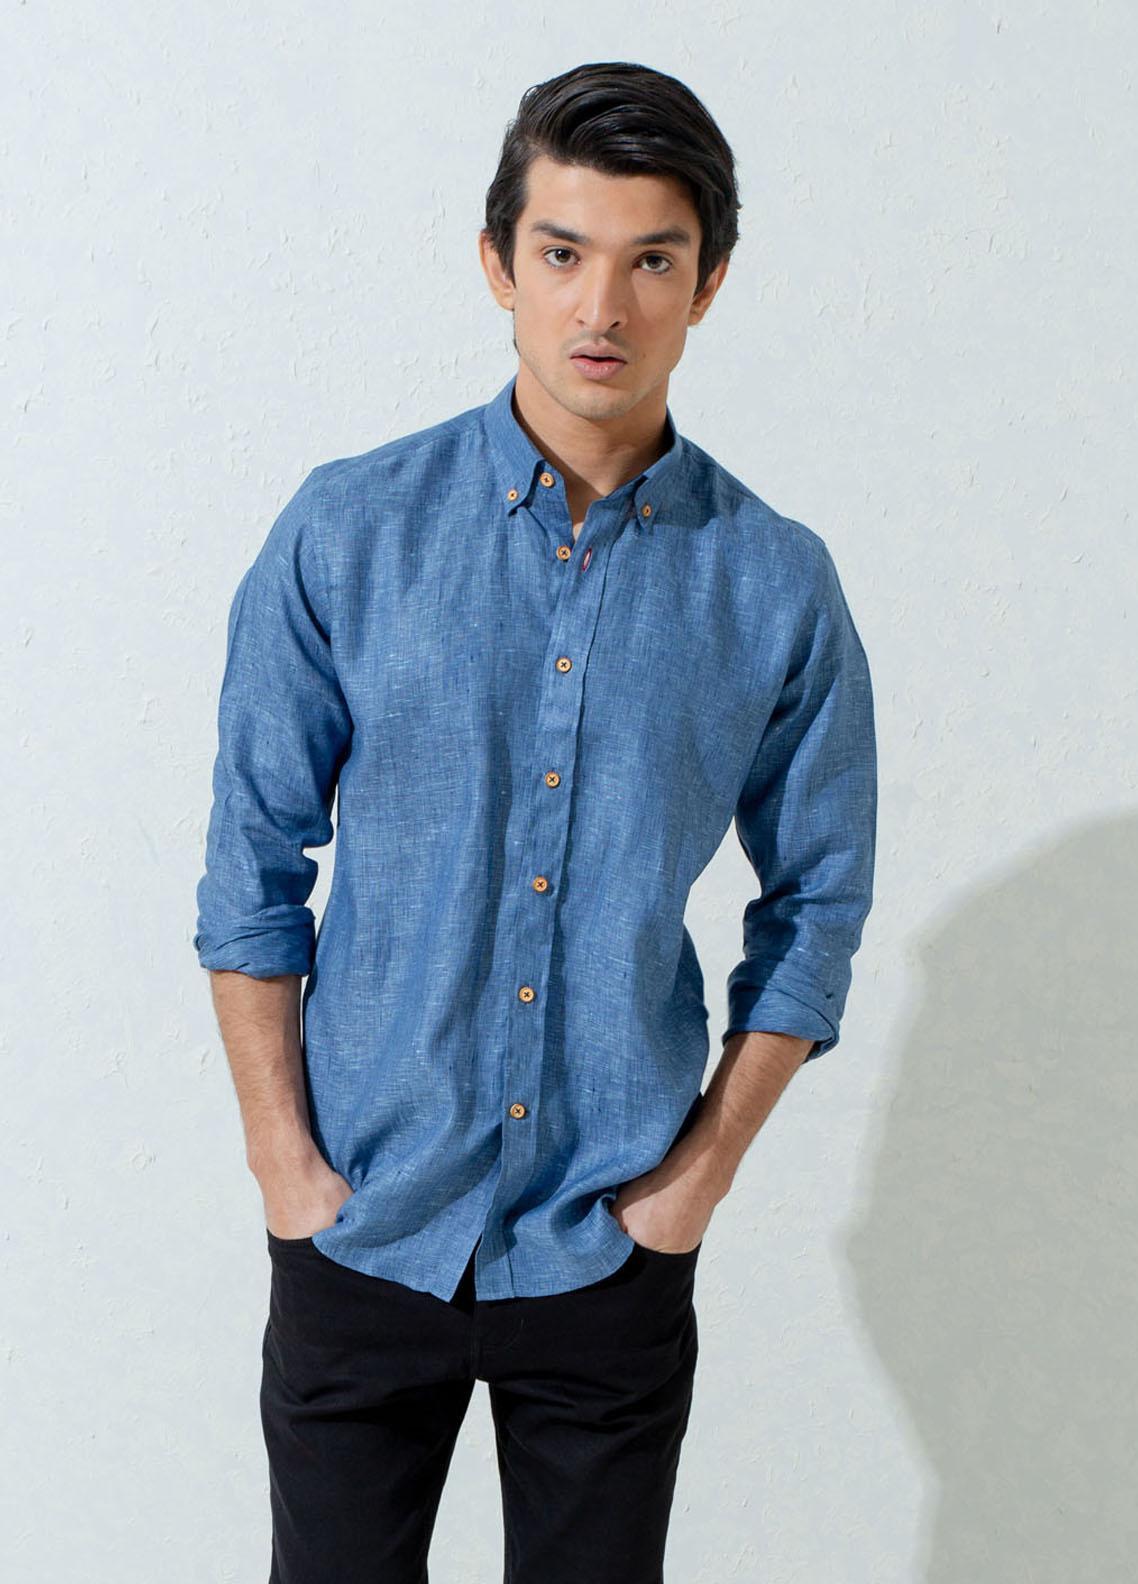 Brumano Linen Casual Shirts for Men -  Blue Linen Structured Button Down